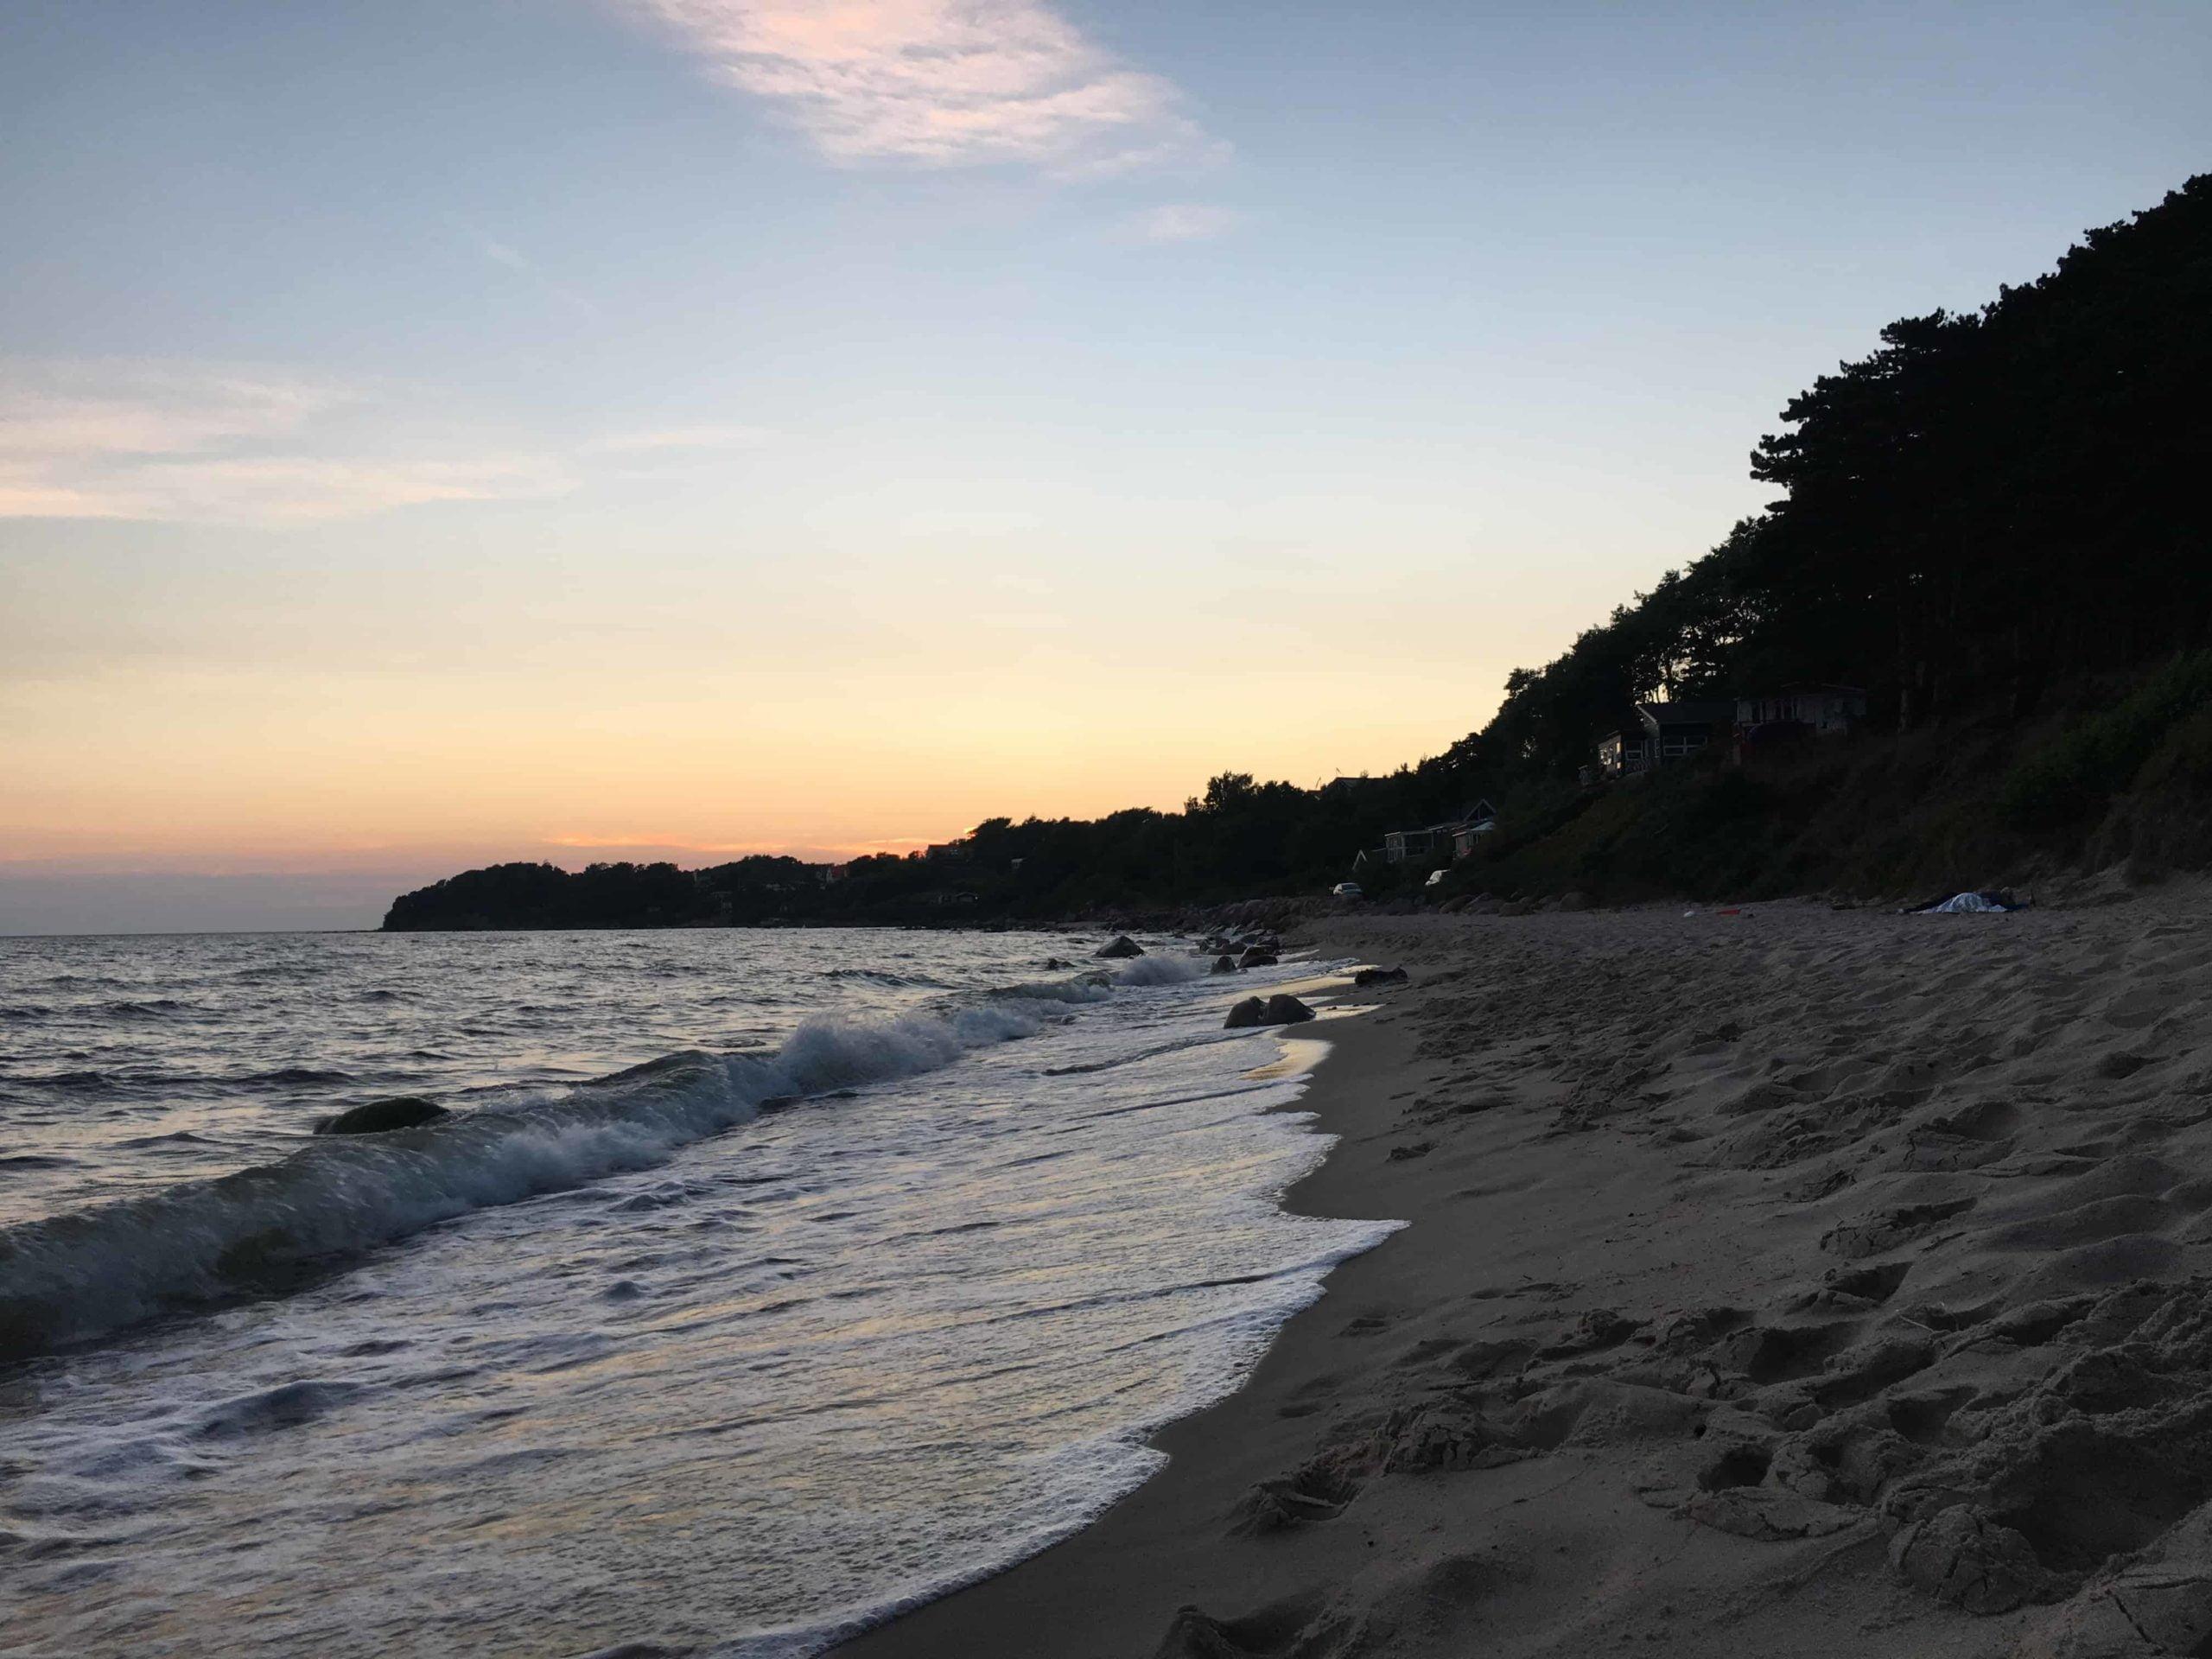 Onsbaeck Beach